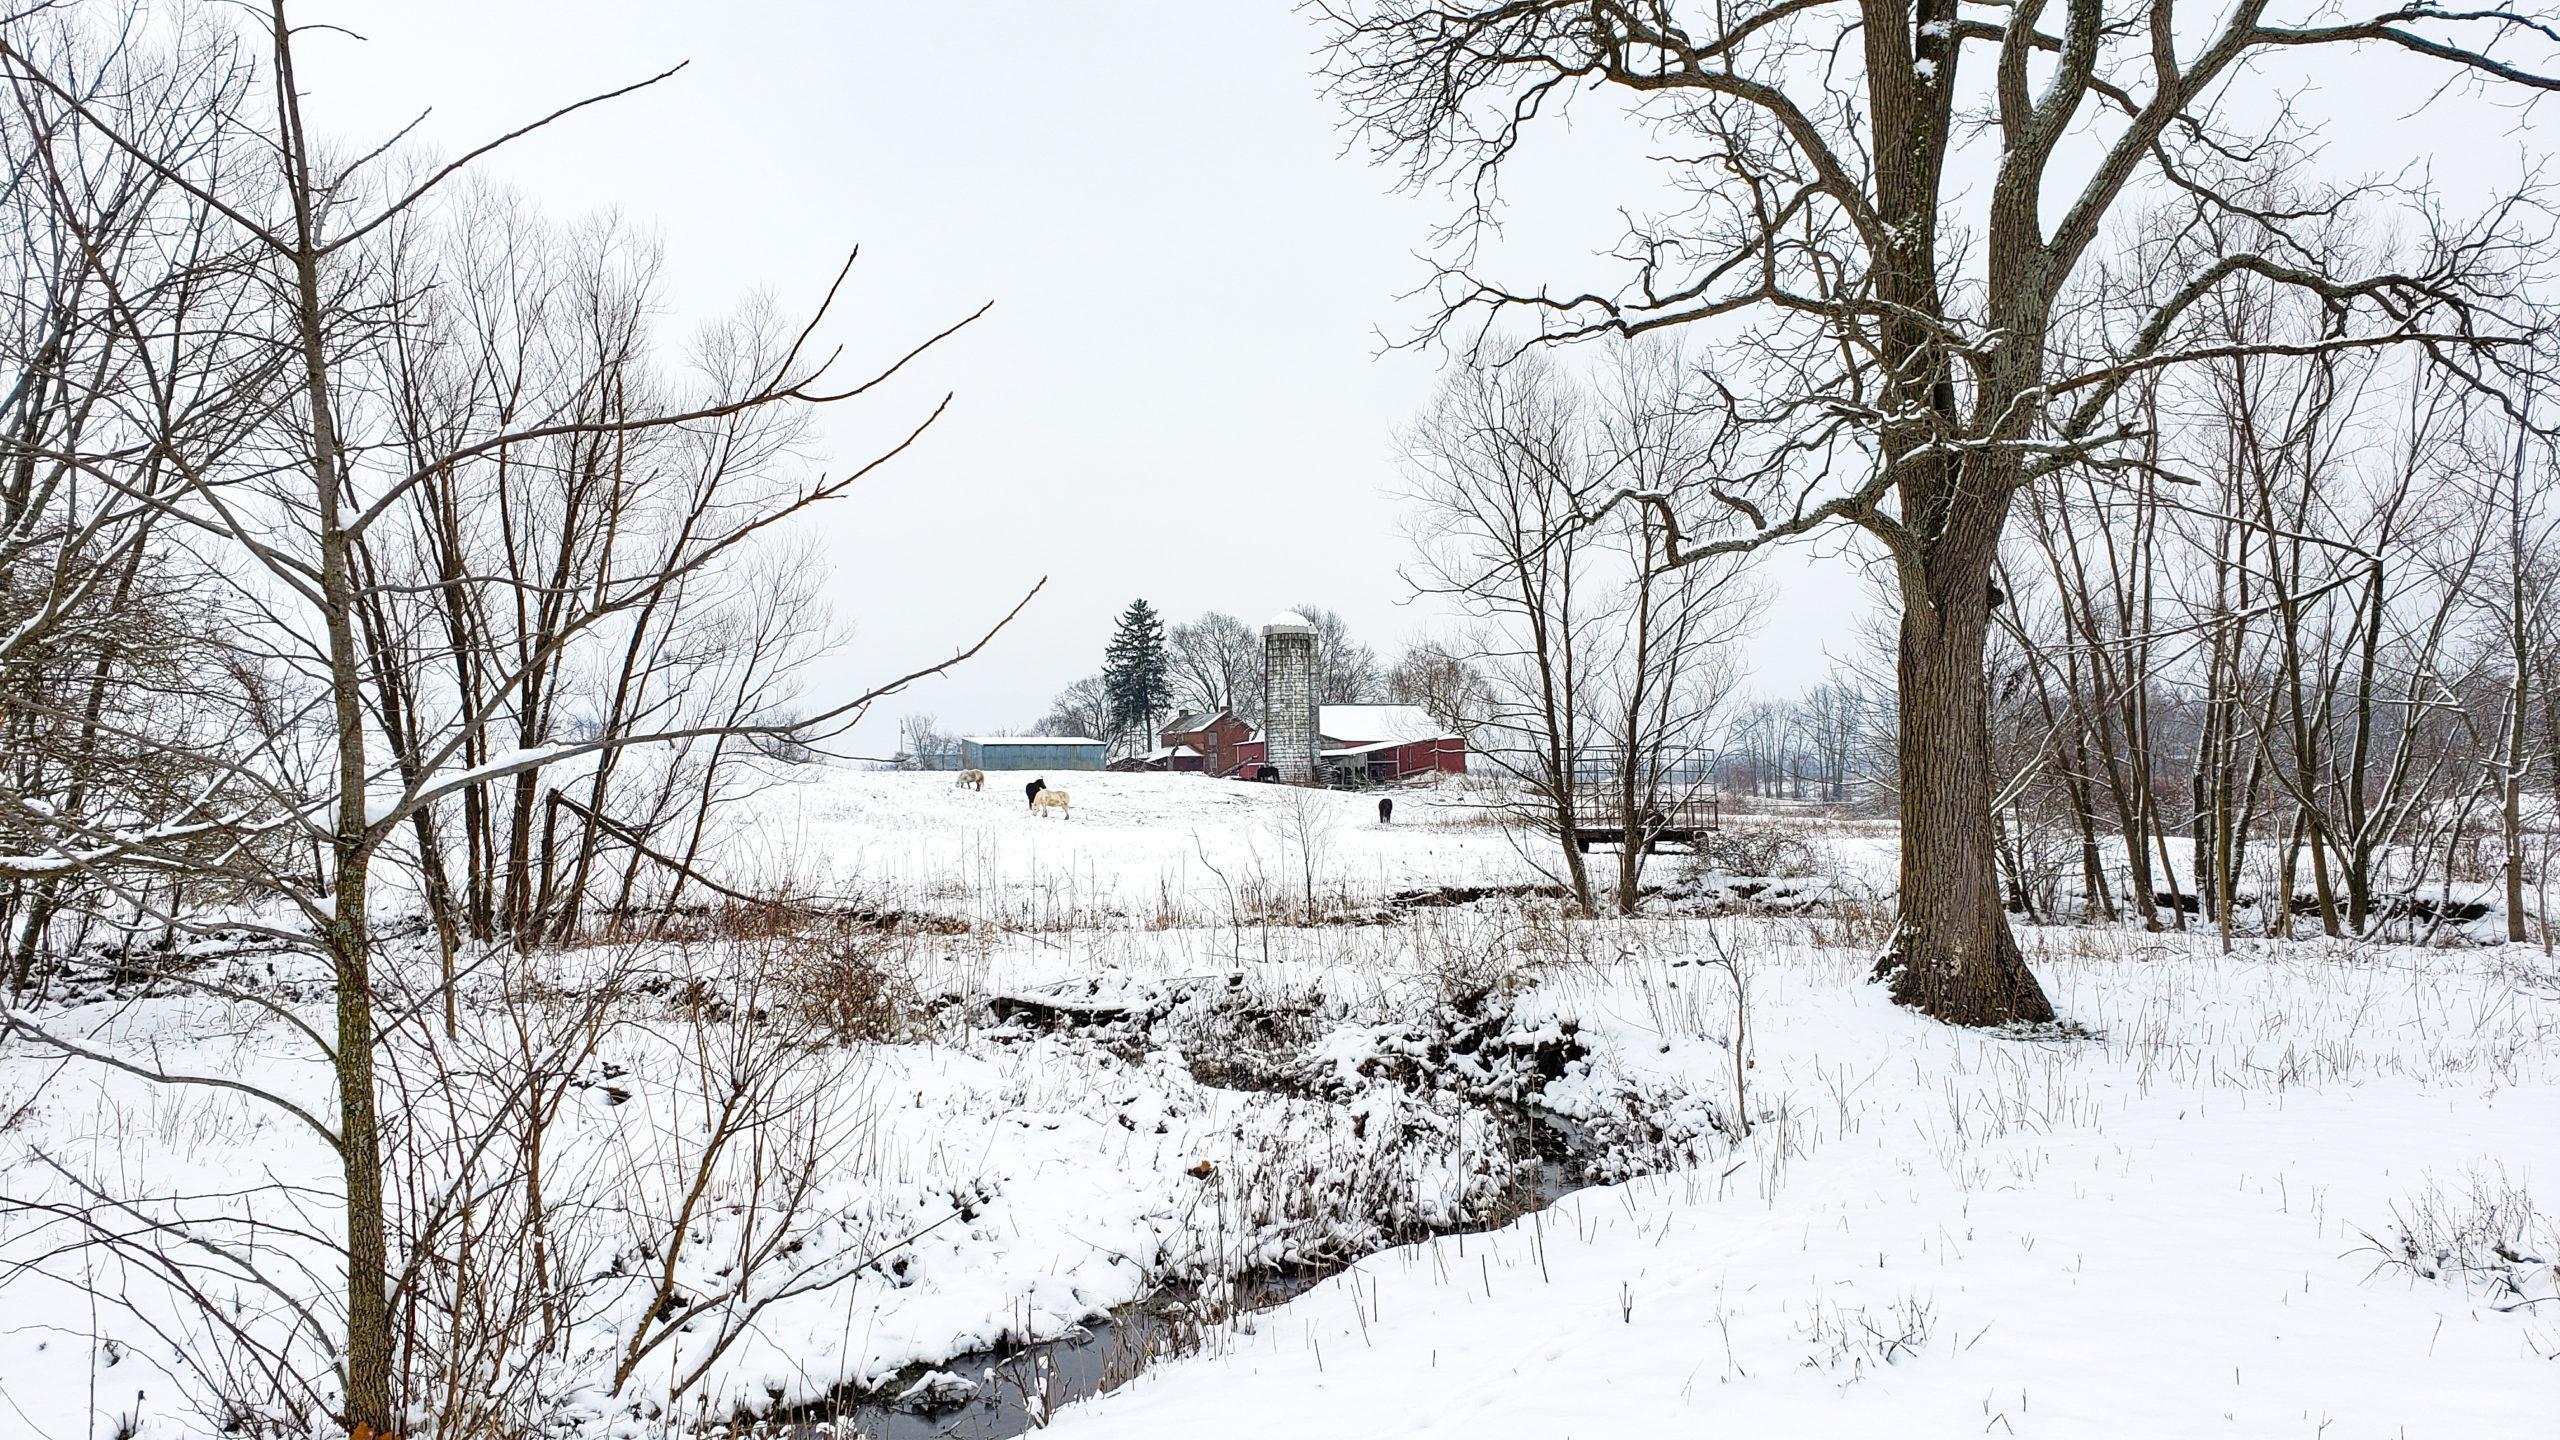 December first snow on the farm